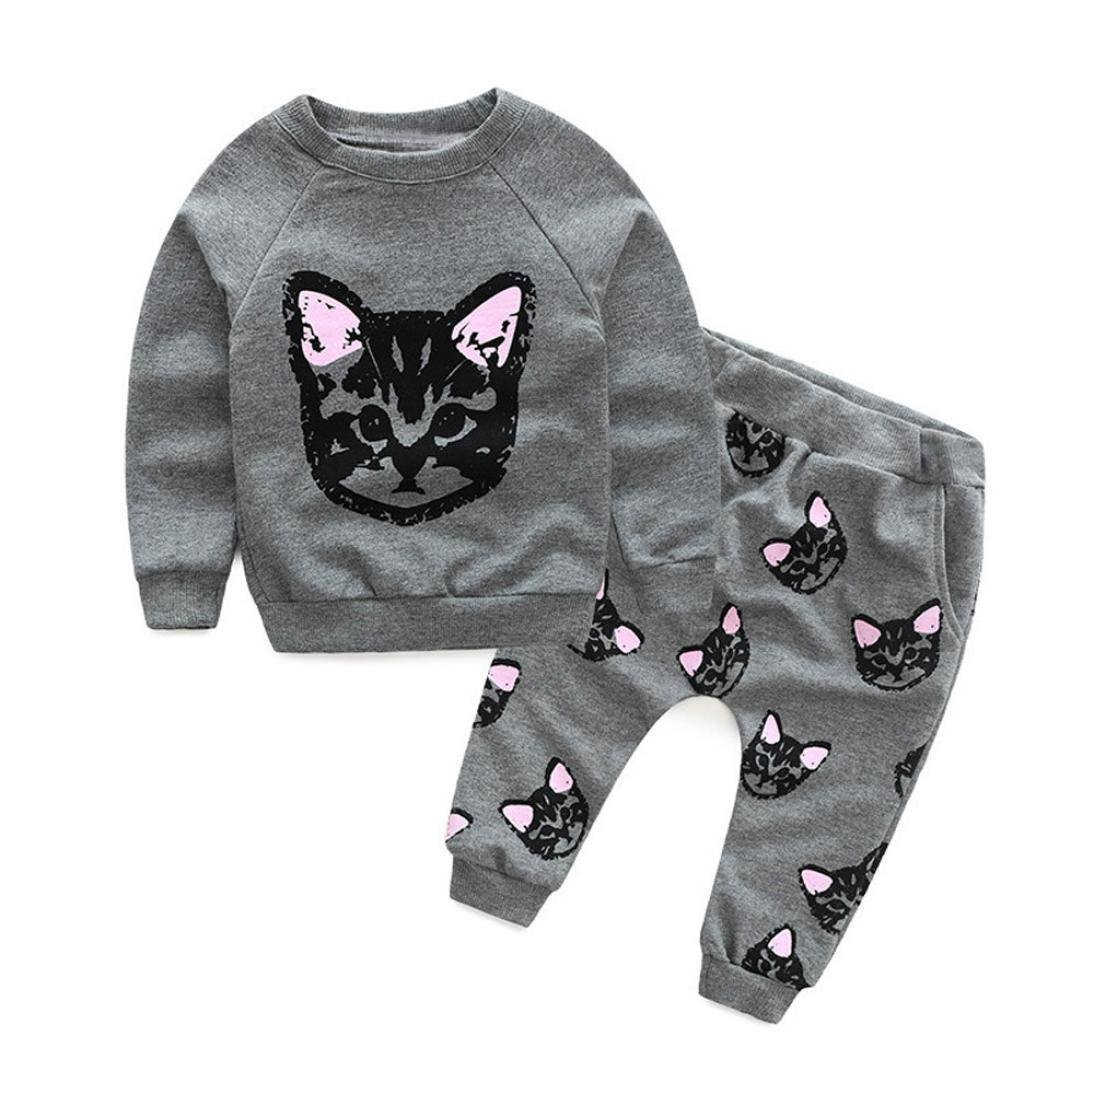 Kids Baby 2Pcs Outfits Set, Cotton Long Sleeve Tracksuit Cute Cartoon Cats Print Sweatshirt +Harem Pants (gray, 6T)